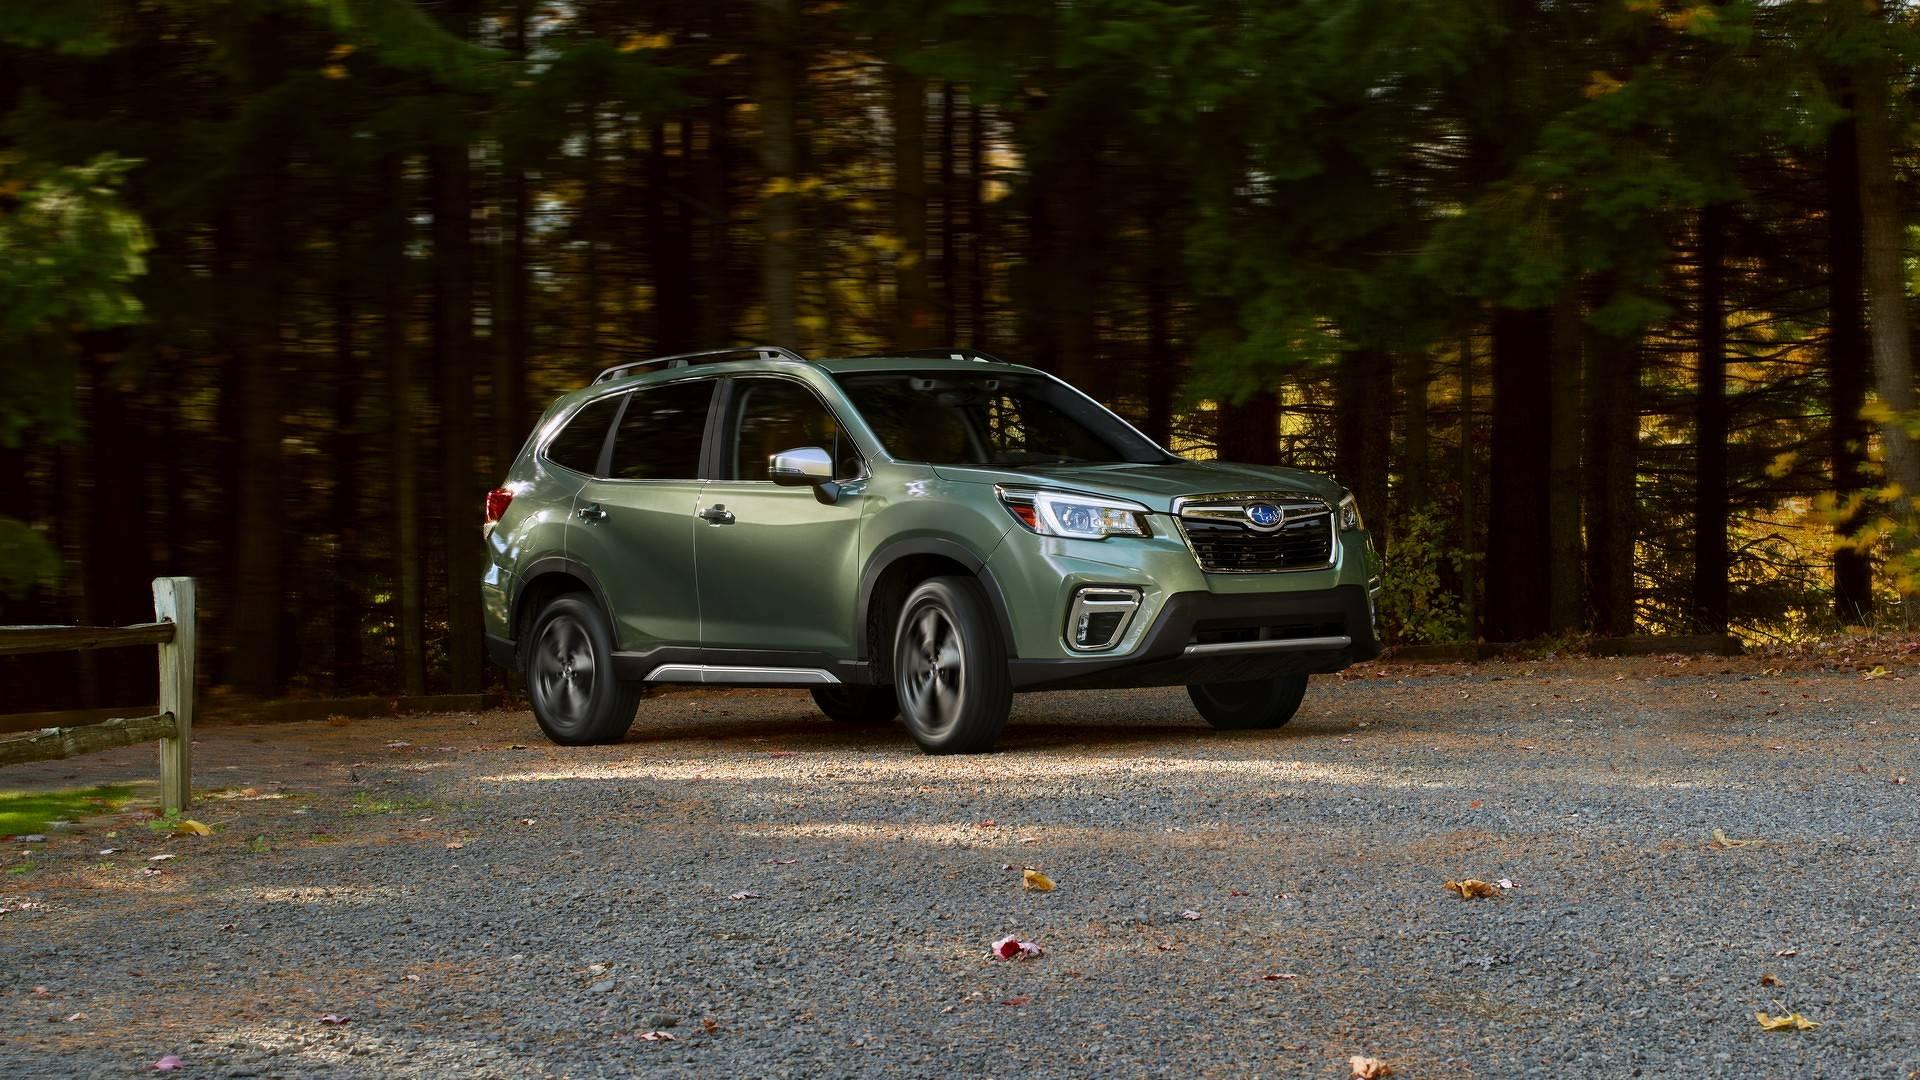 Subaru Forester Handling Car Reviews 2018 2 5xt Engine Diagram 2019 Boasts More Cargo Room Efficiency